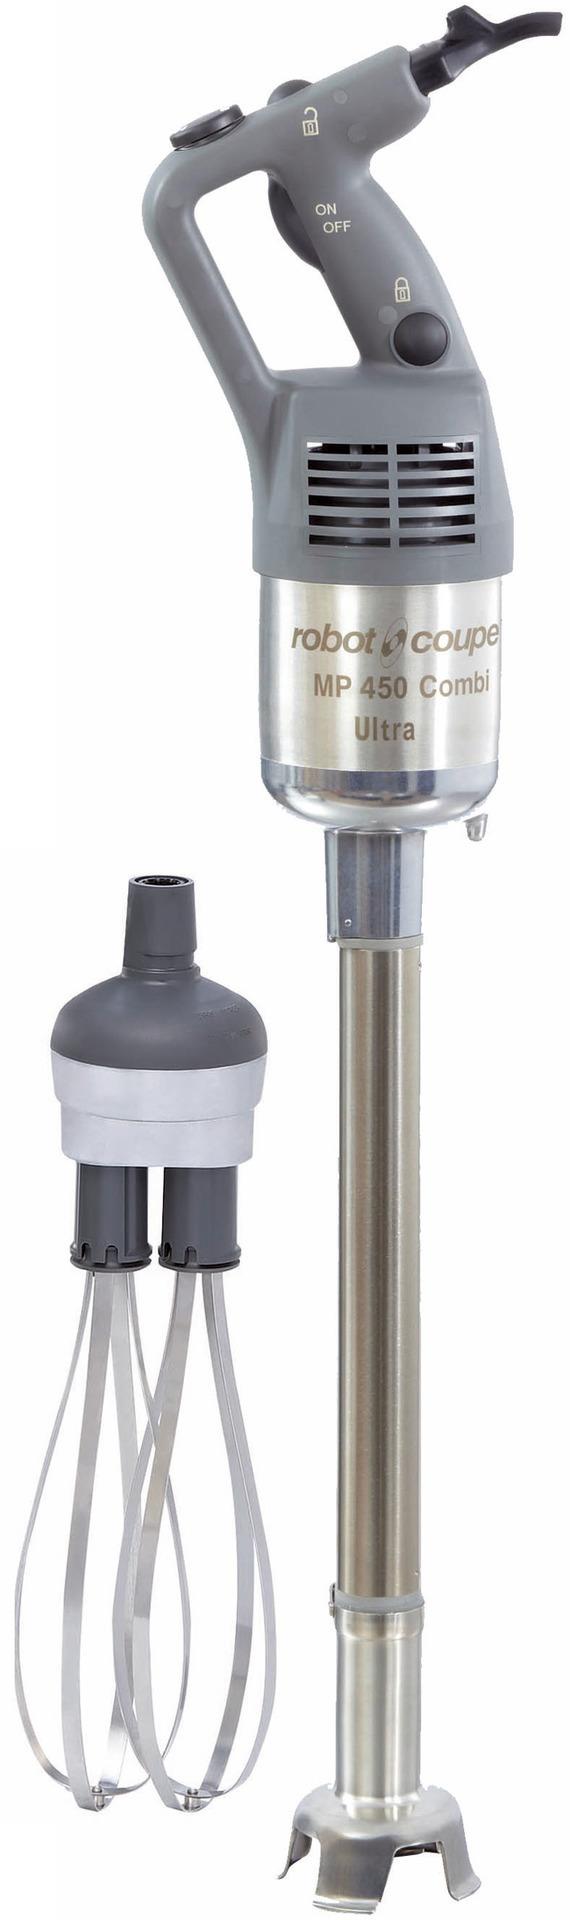 Stabmixer MP 450 mm Combi Ultra /  mit Rührbesen / 230 V / 0,50 kW